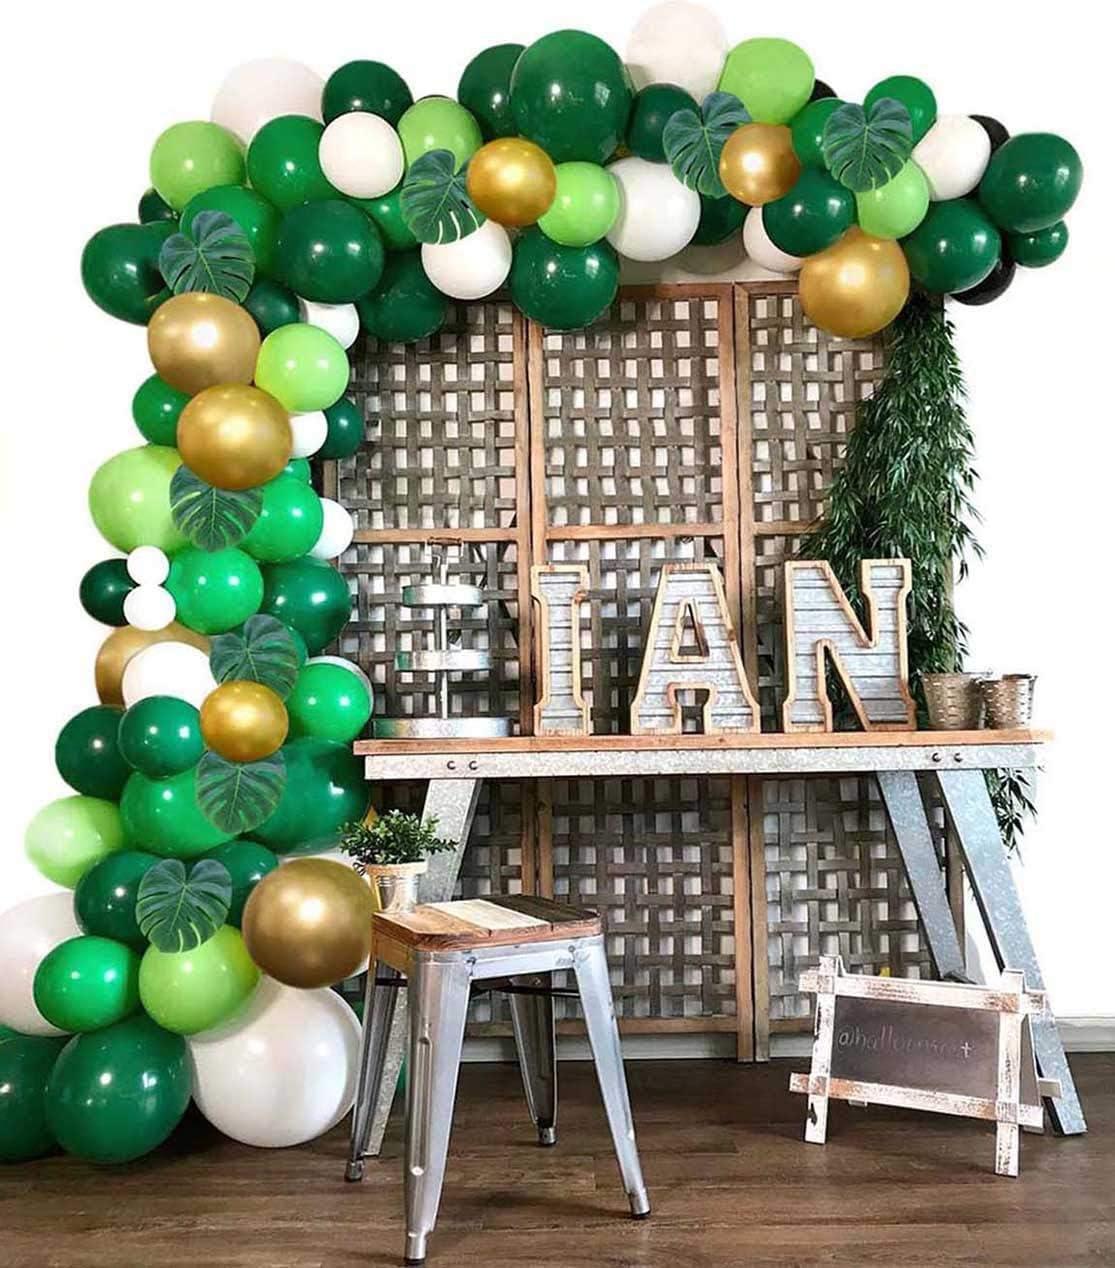 1 Air Pump Safri Party Supplies and Favors 2 Balloon Tying Tools 16 Feets Arch Balloon Strip Tape Tresbro Jungle Safari Theme Party Decorations 175pcs 130 Latex Balloons 24 Green Palm Leaves